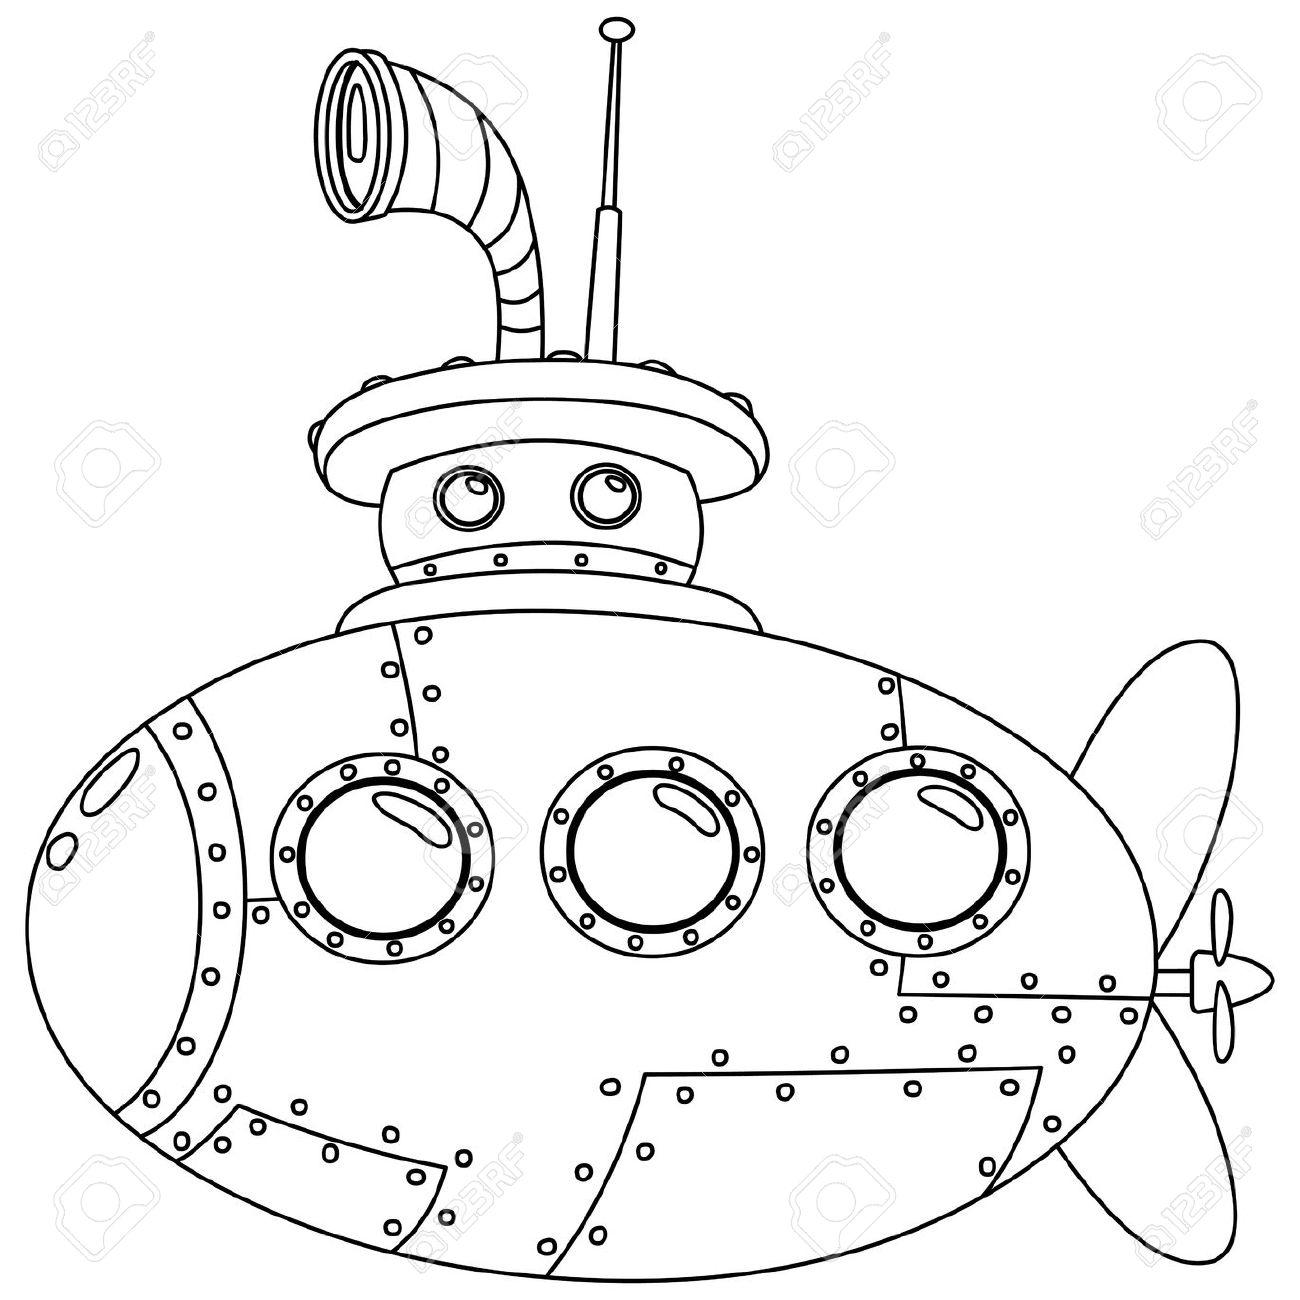 Submarine coloring #3, Download drawings